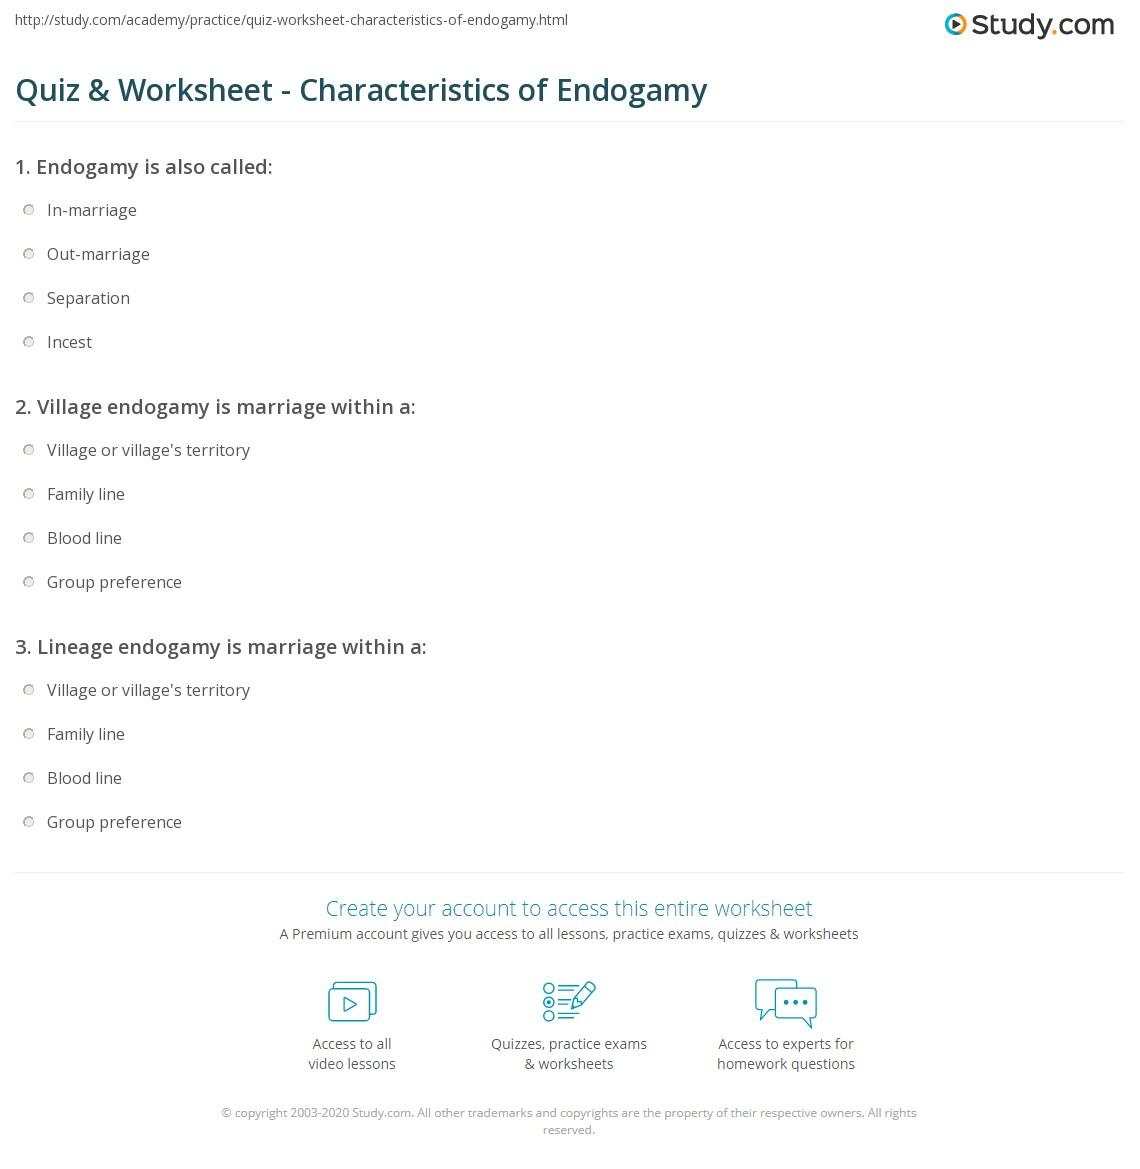 endogamy definition